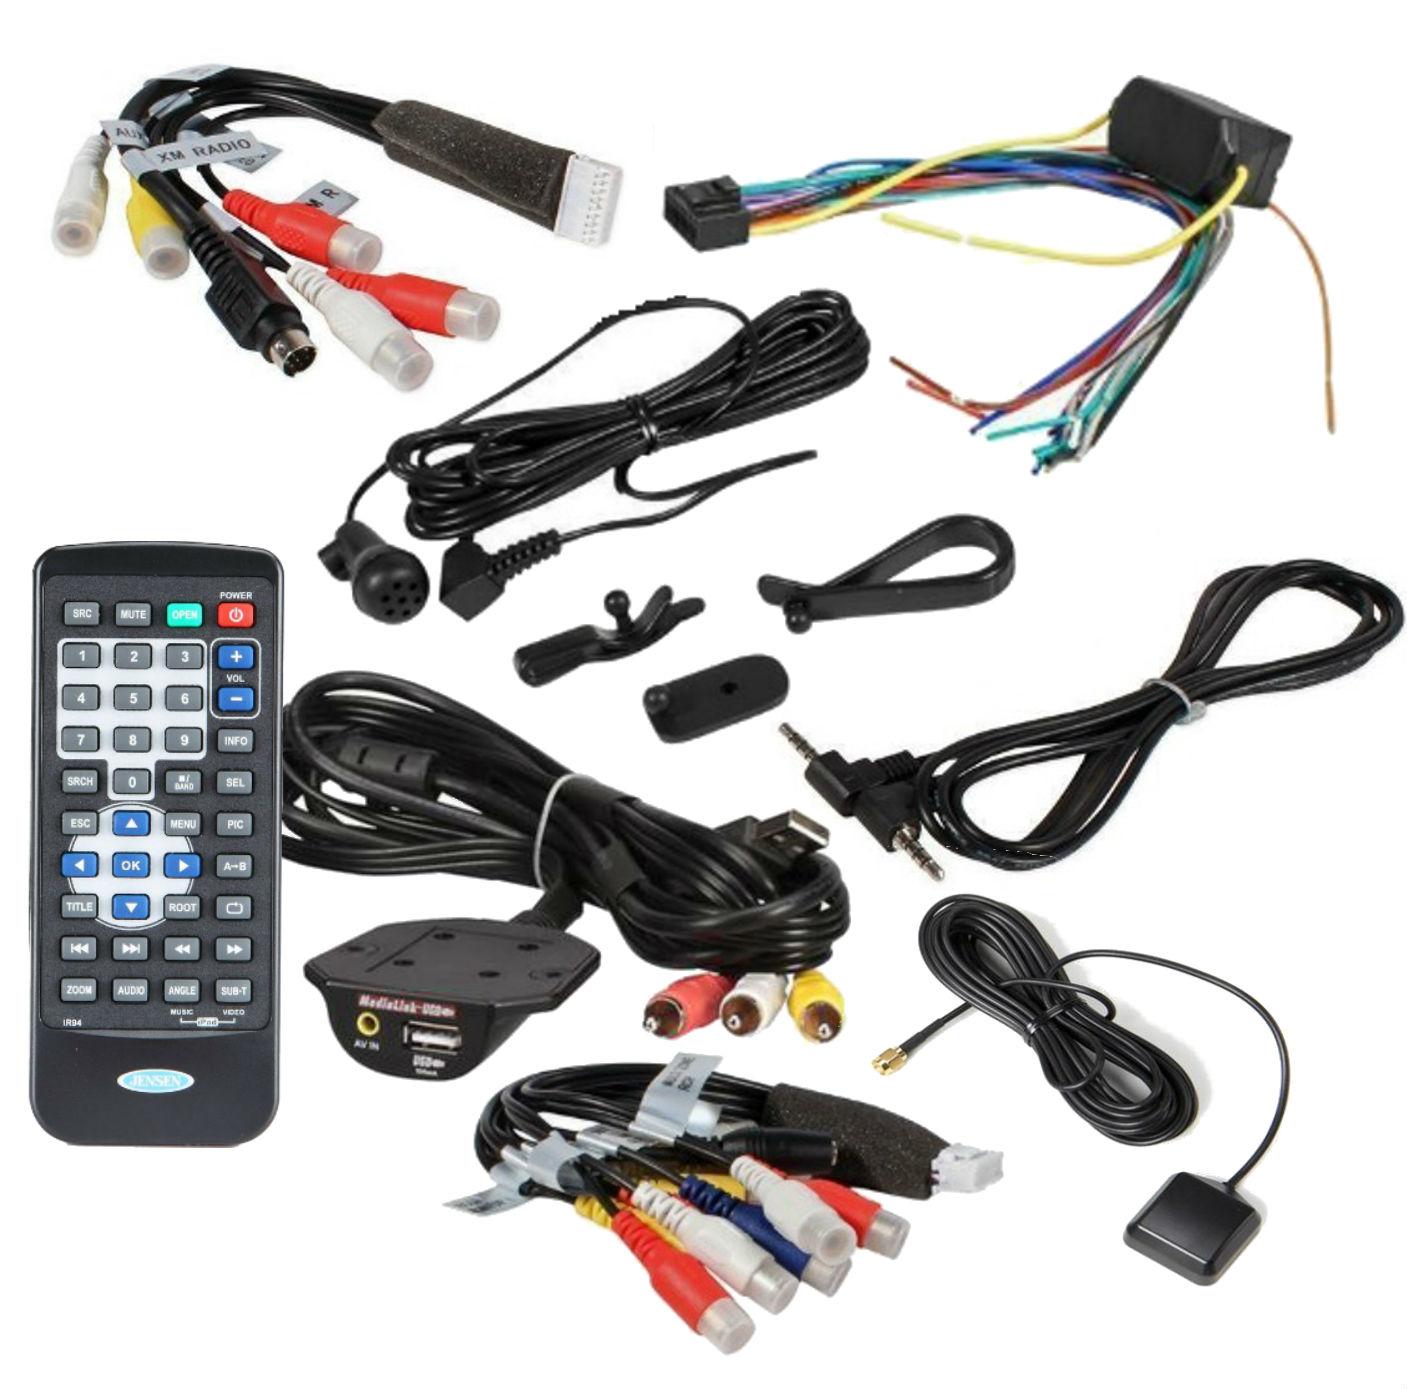 Jensen Vm9213 Wiring Harness Free Download Wiring Diagrams Vm9424btbaccpk Jensen  Vm9213 Wiring Harnesshtml